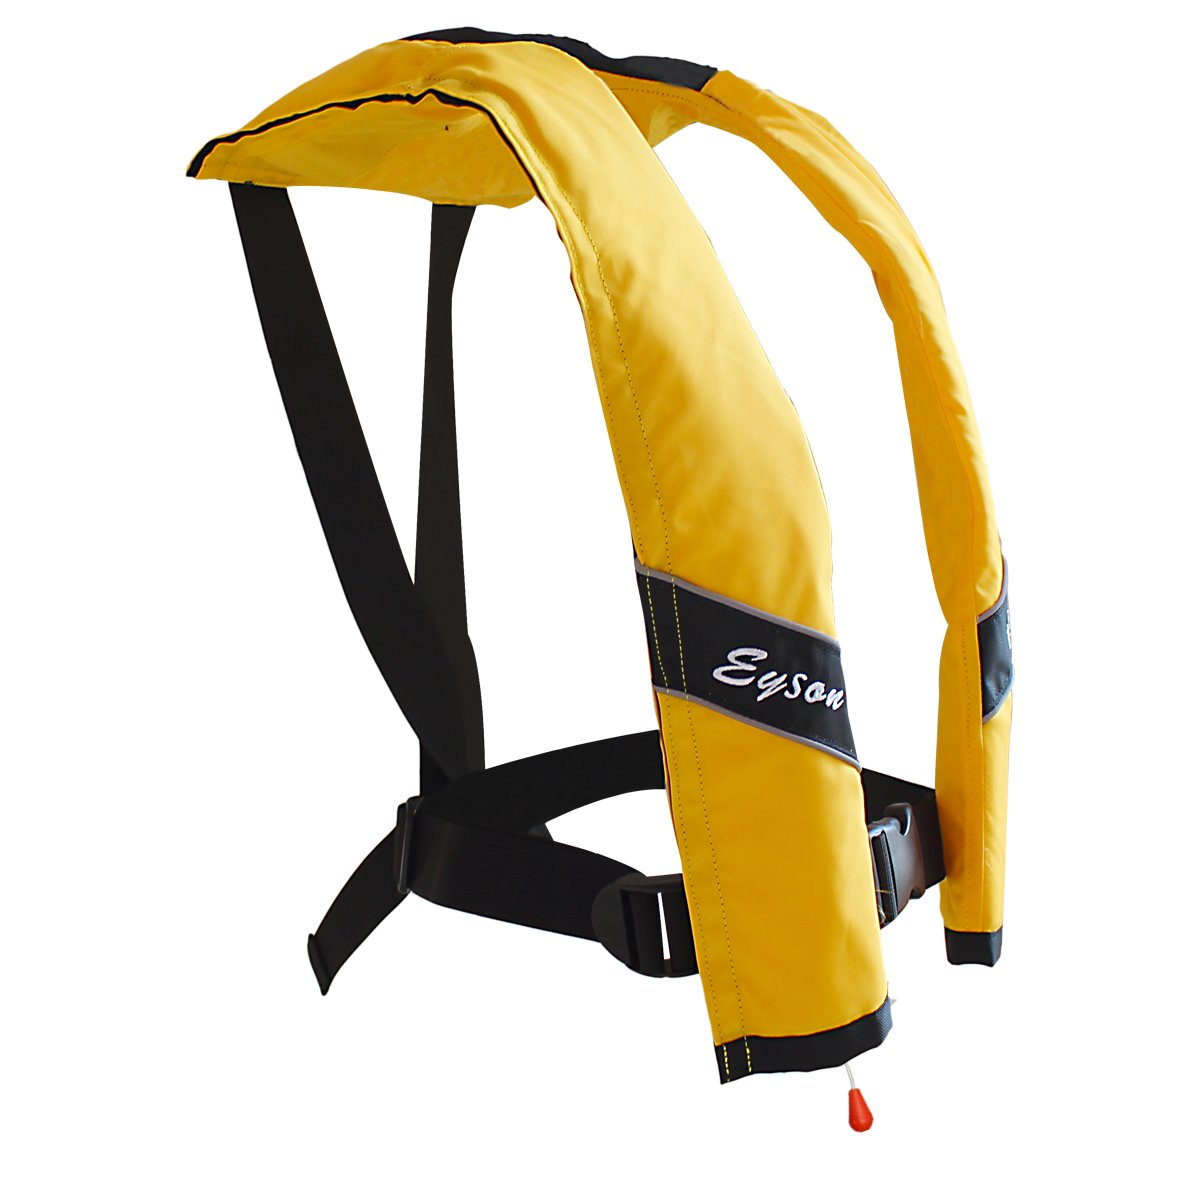 Eyson Slim Inflatable PFD Life Jacket Life Vest Adult Automatic (Yellow)